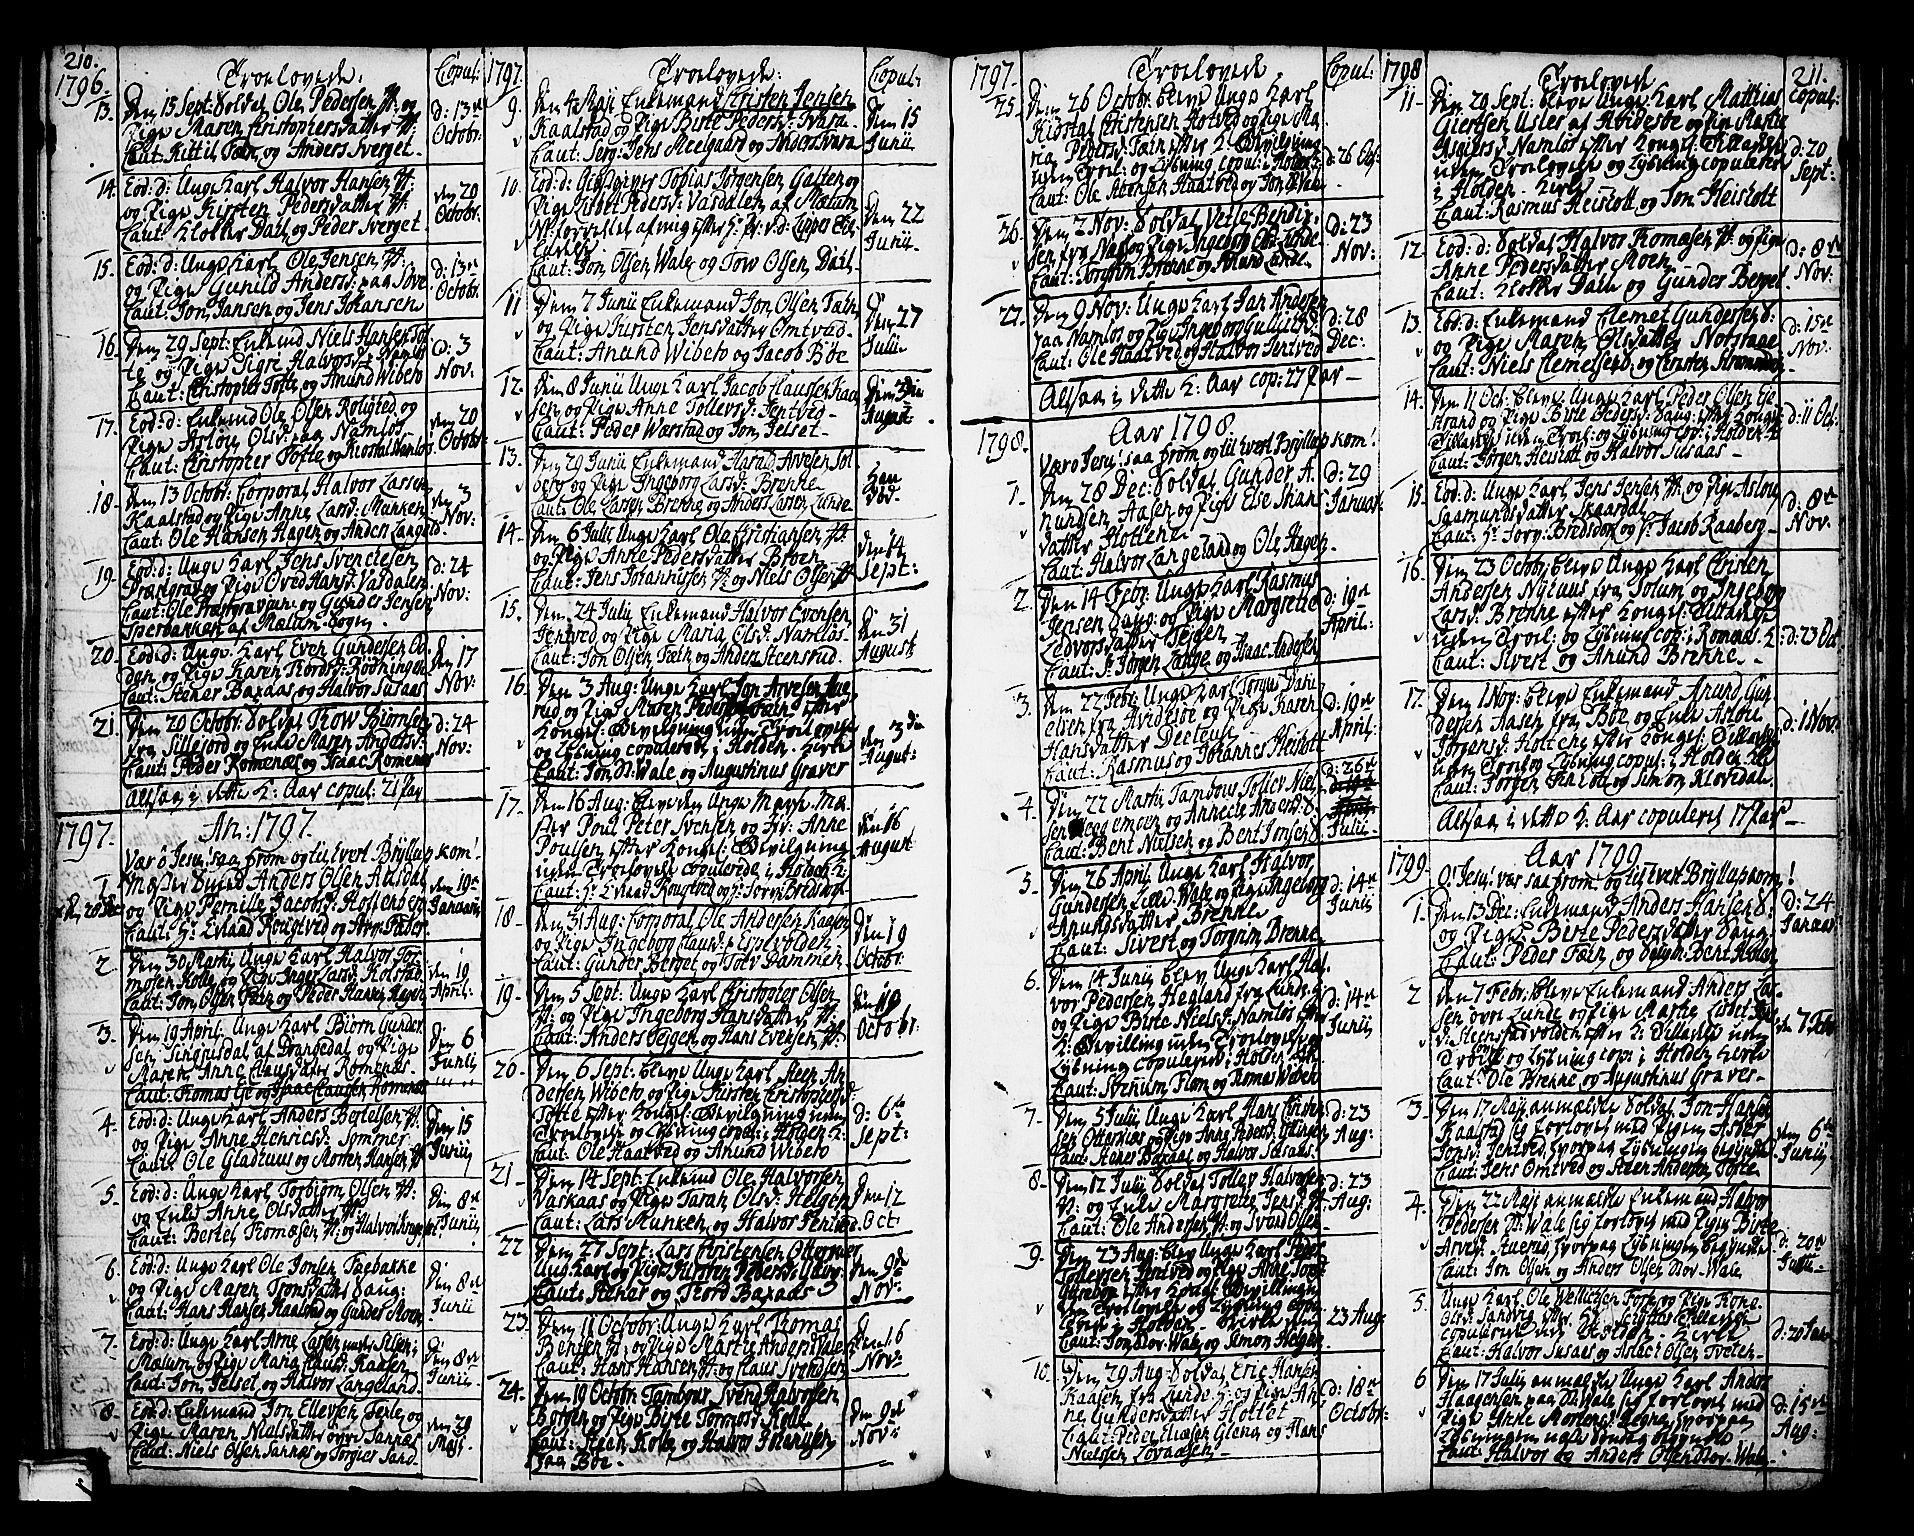 SAKO, Holla kirkebøker, F/Fa/L0002: Ministerialbok nr. 2, 1779-1814, s. 210-211